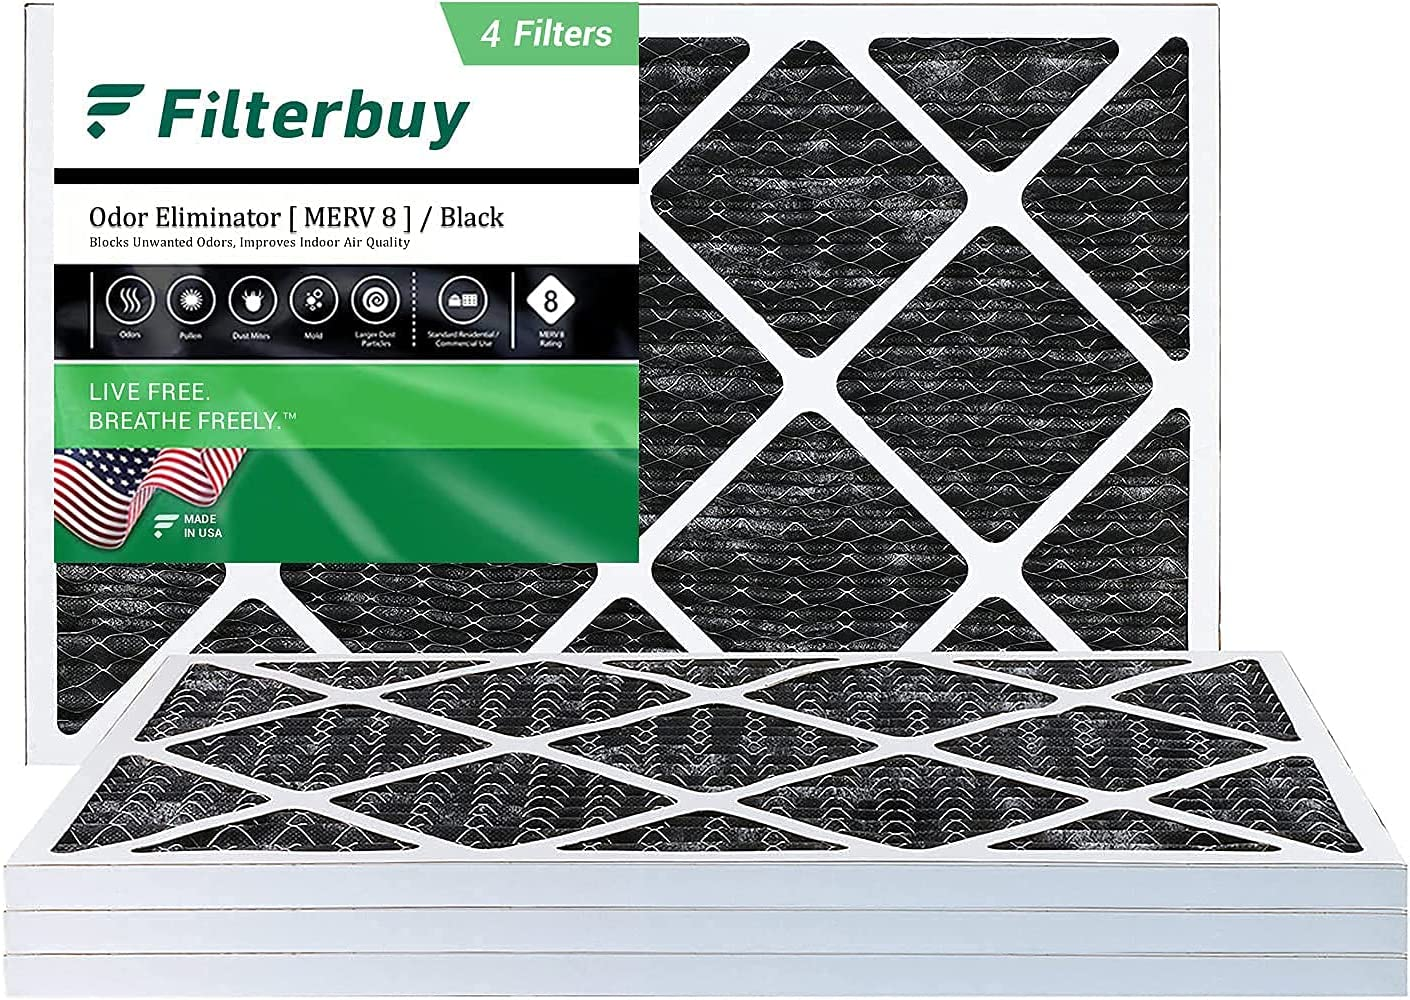 FilterBuy 18x30x1 Air Filter MERV Eliminator 8 Product Allergen Odor Max 73% OFF